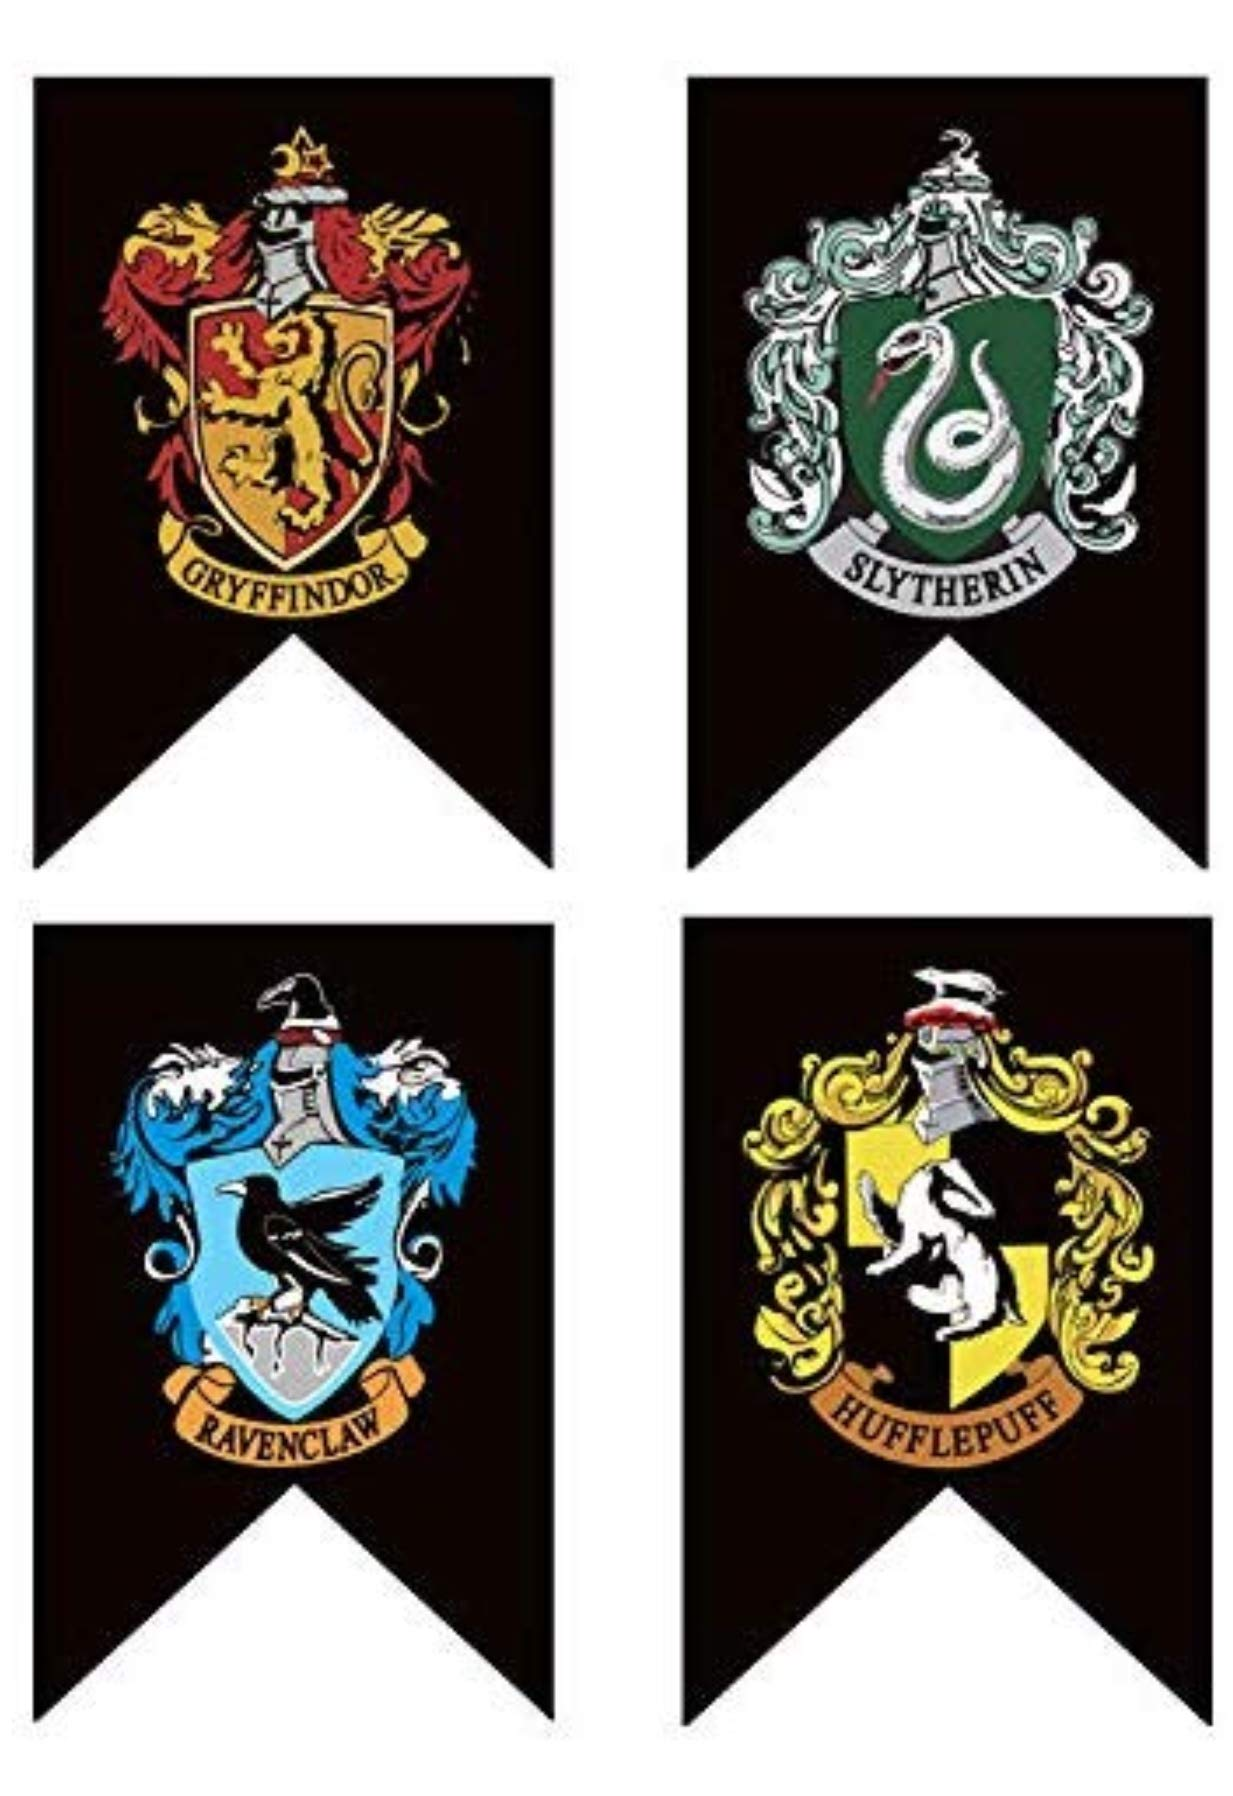 Harry Potter Banner - Complete Hogwarts House Wall Banner-Ultra Premium - Indoor Outdoor Party Flag - Gryffindor, Slytherin, Hufflepuff, Ravenclaw Banner Set (4PACK)